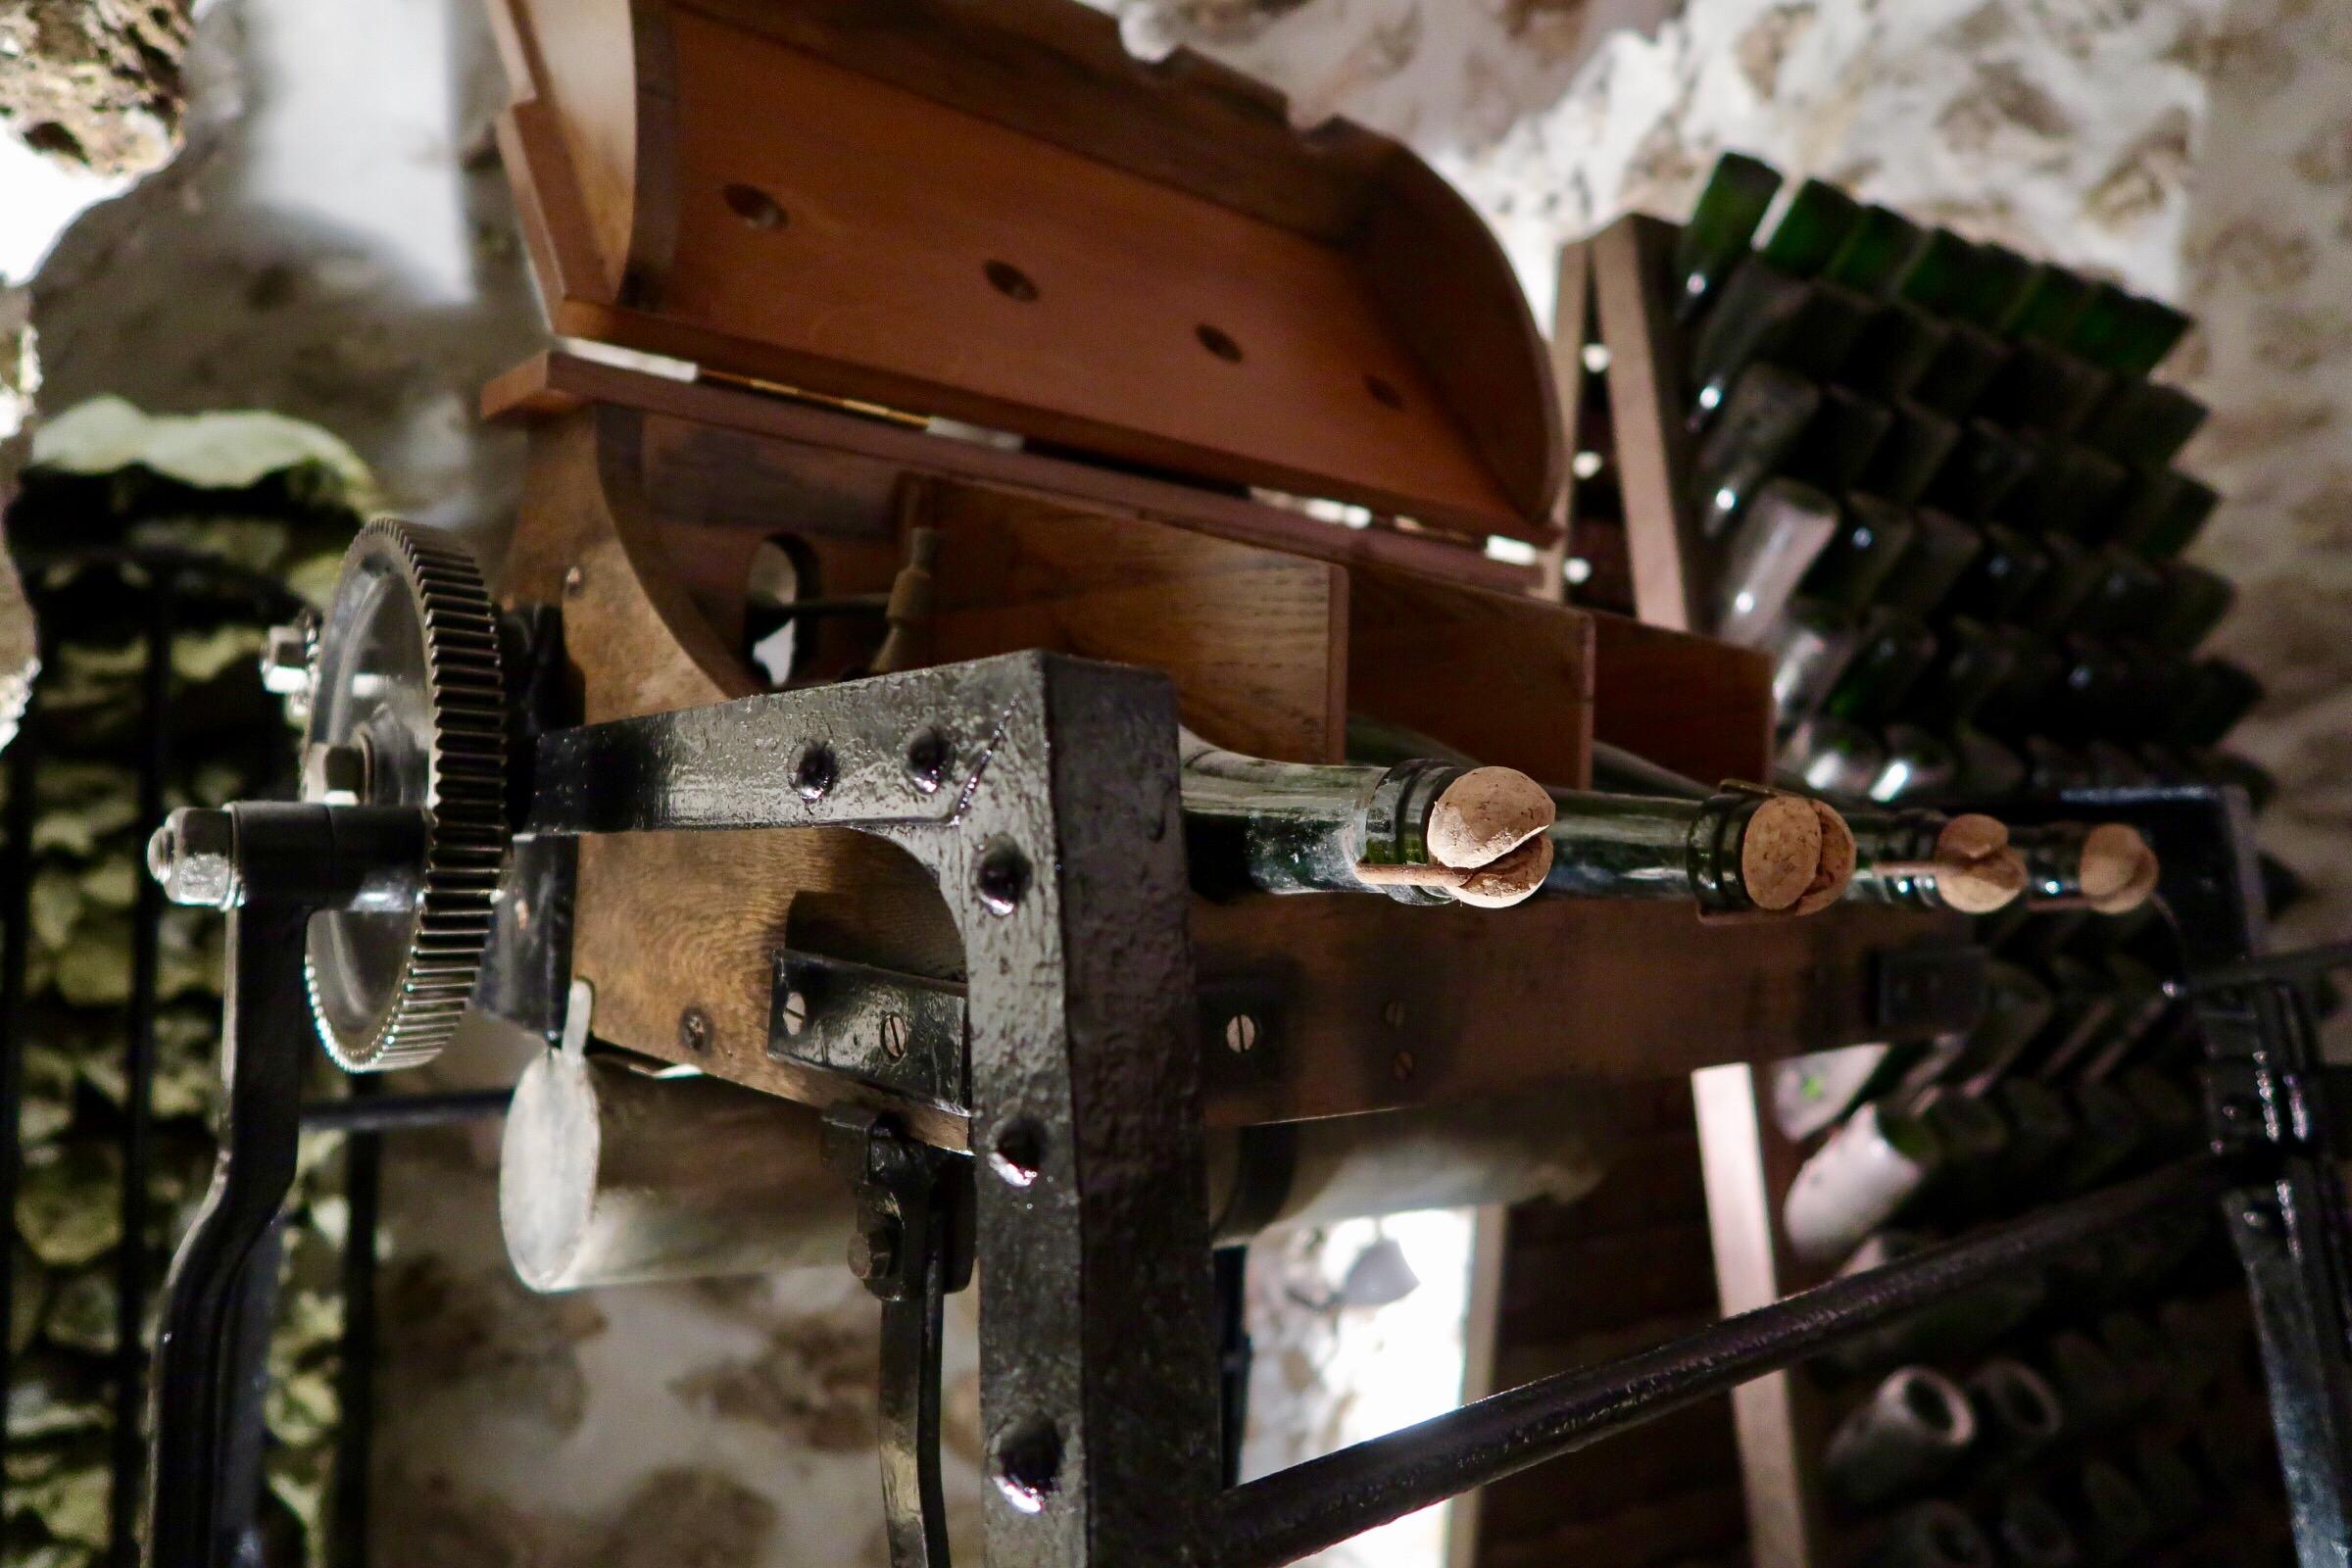 Old wine/champagne making machinery